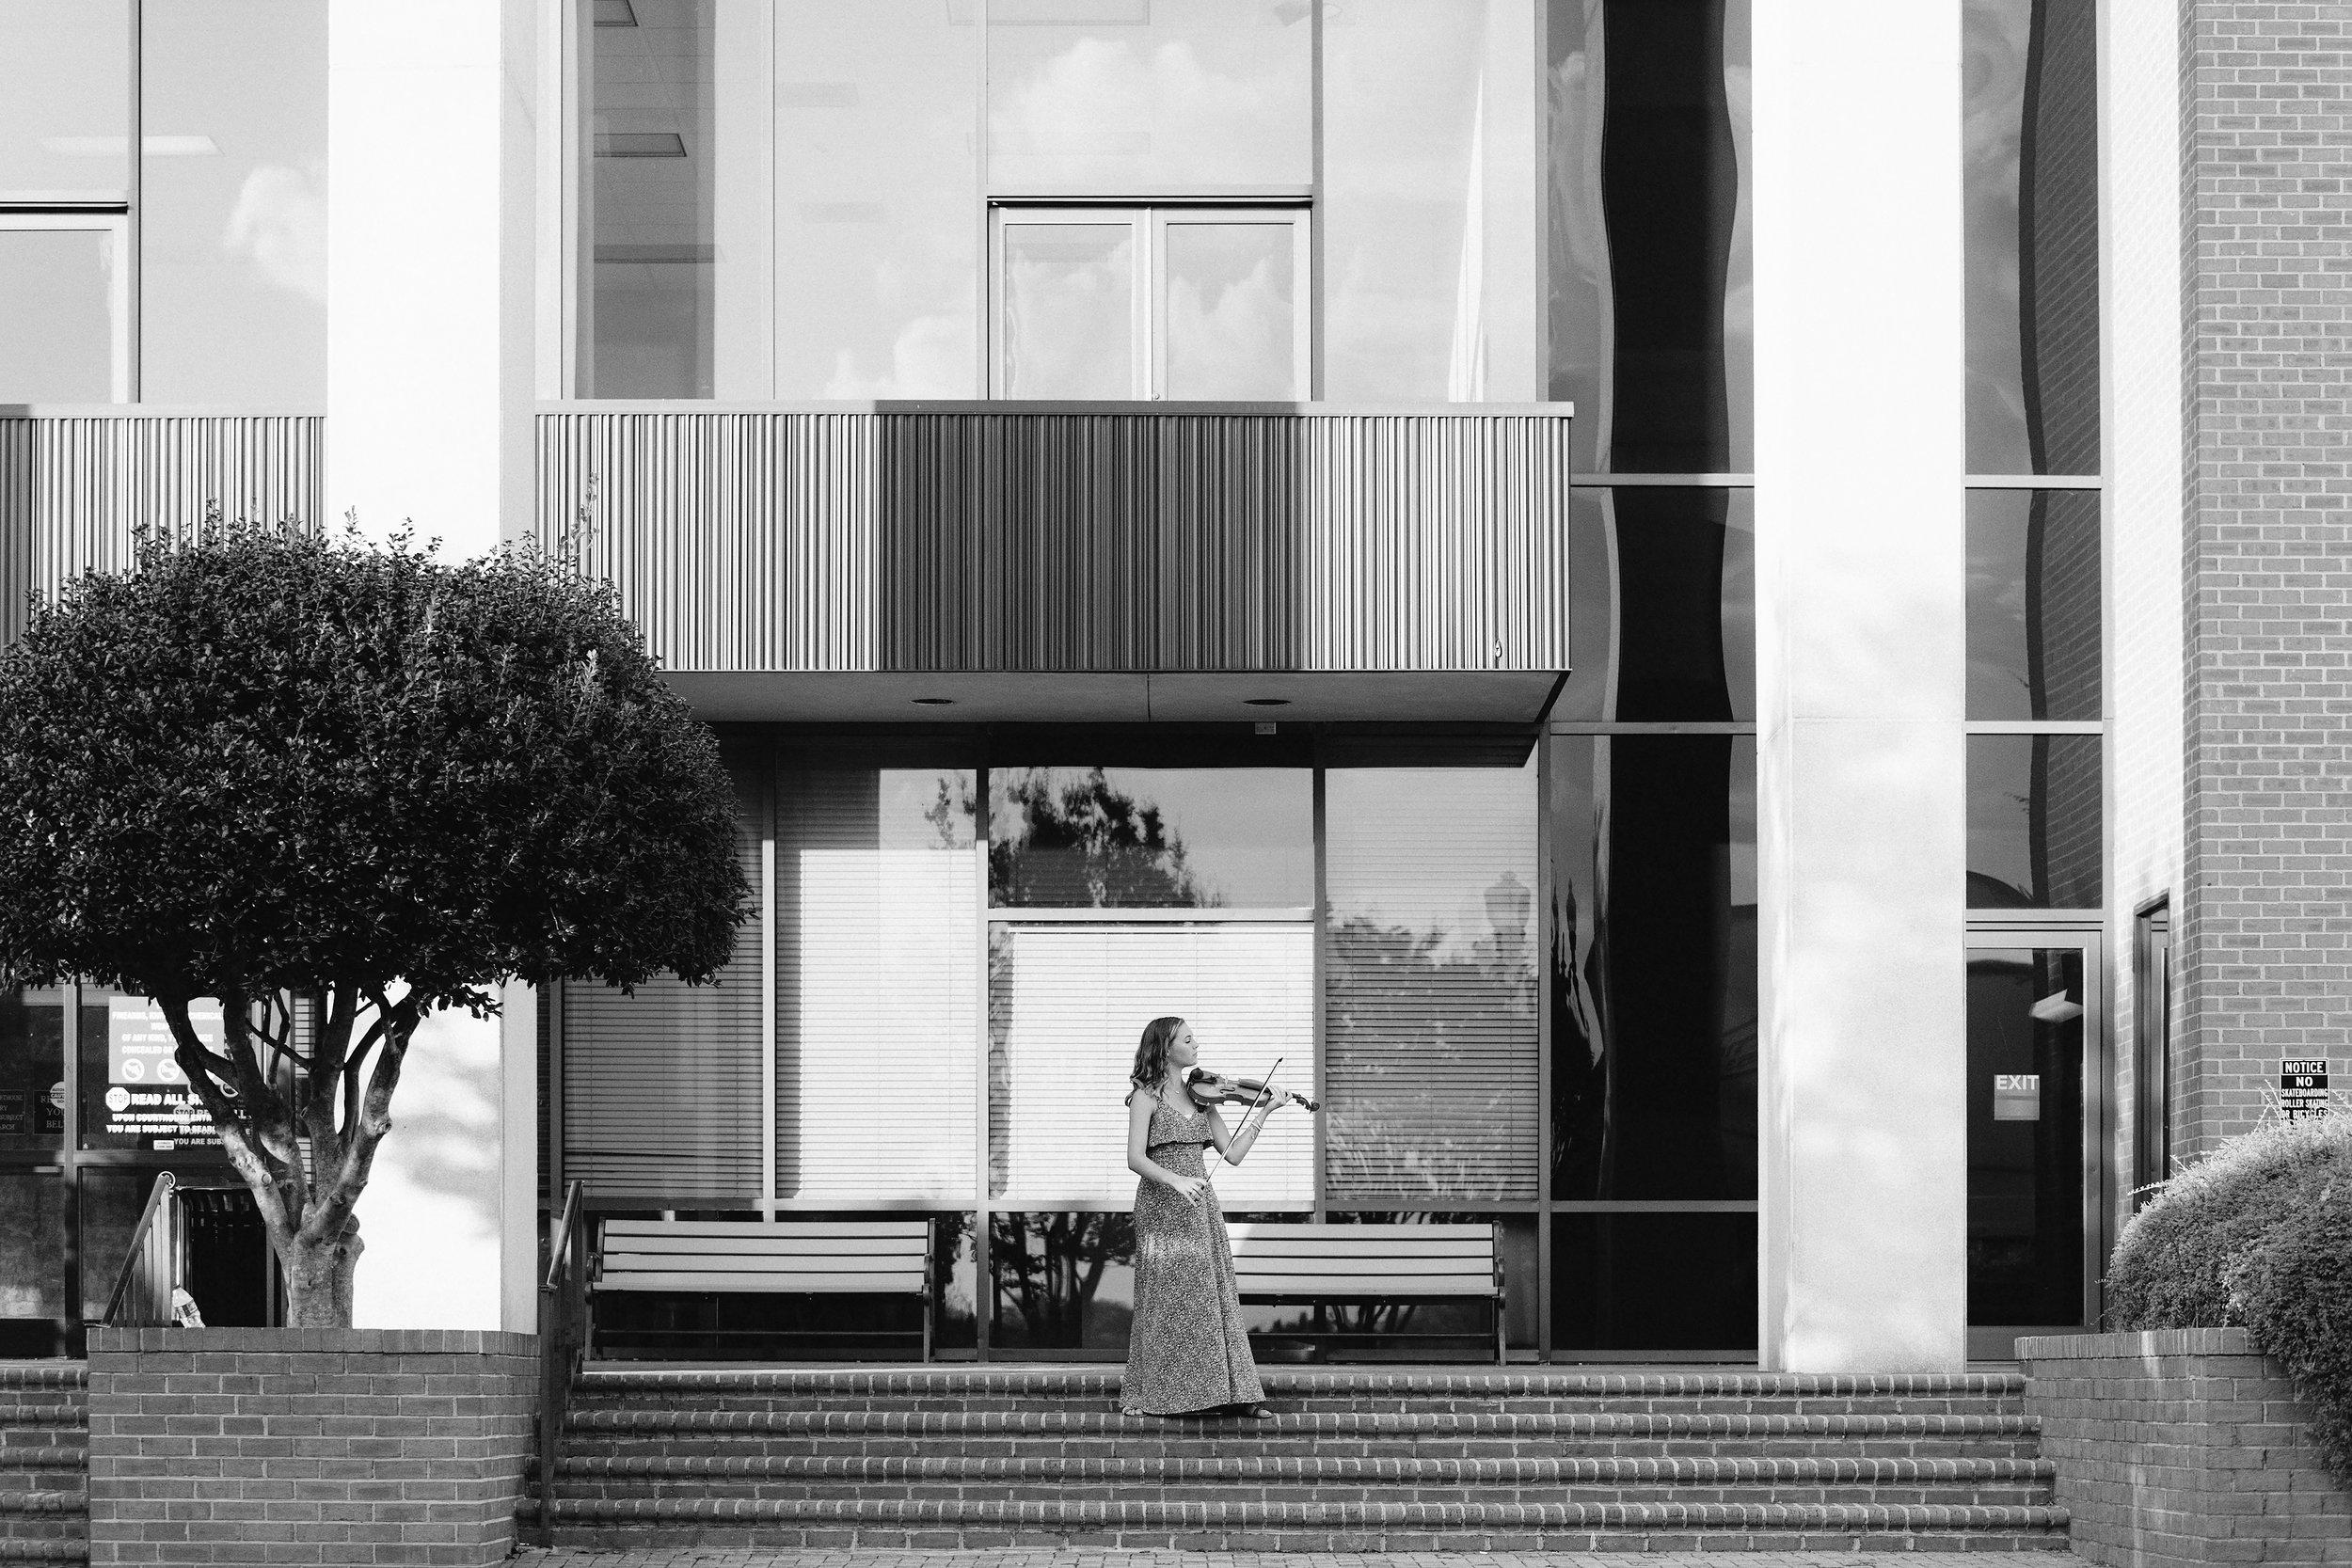 violin-on-steps-BW.jpg